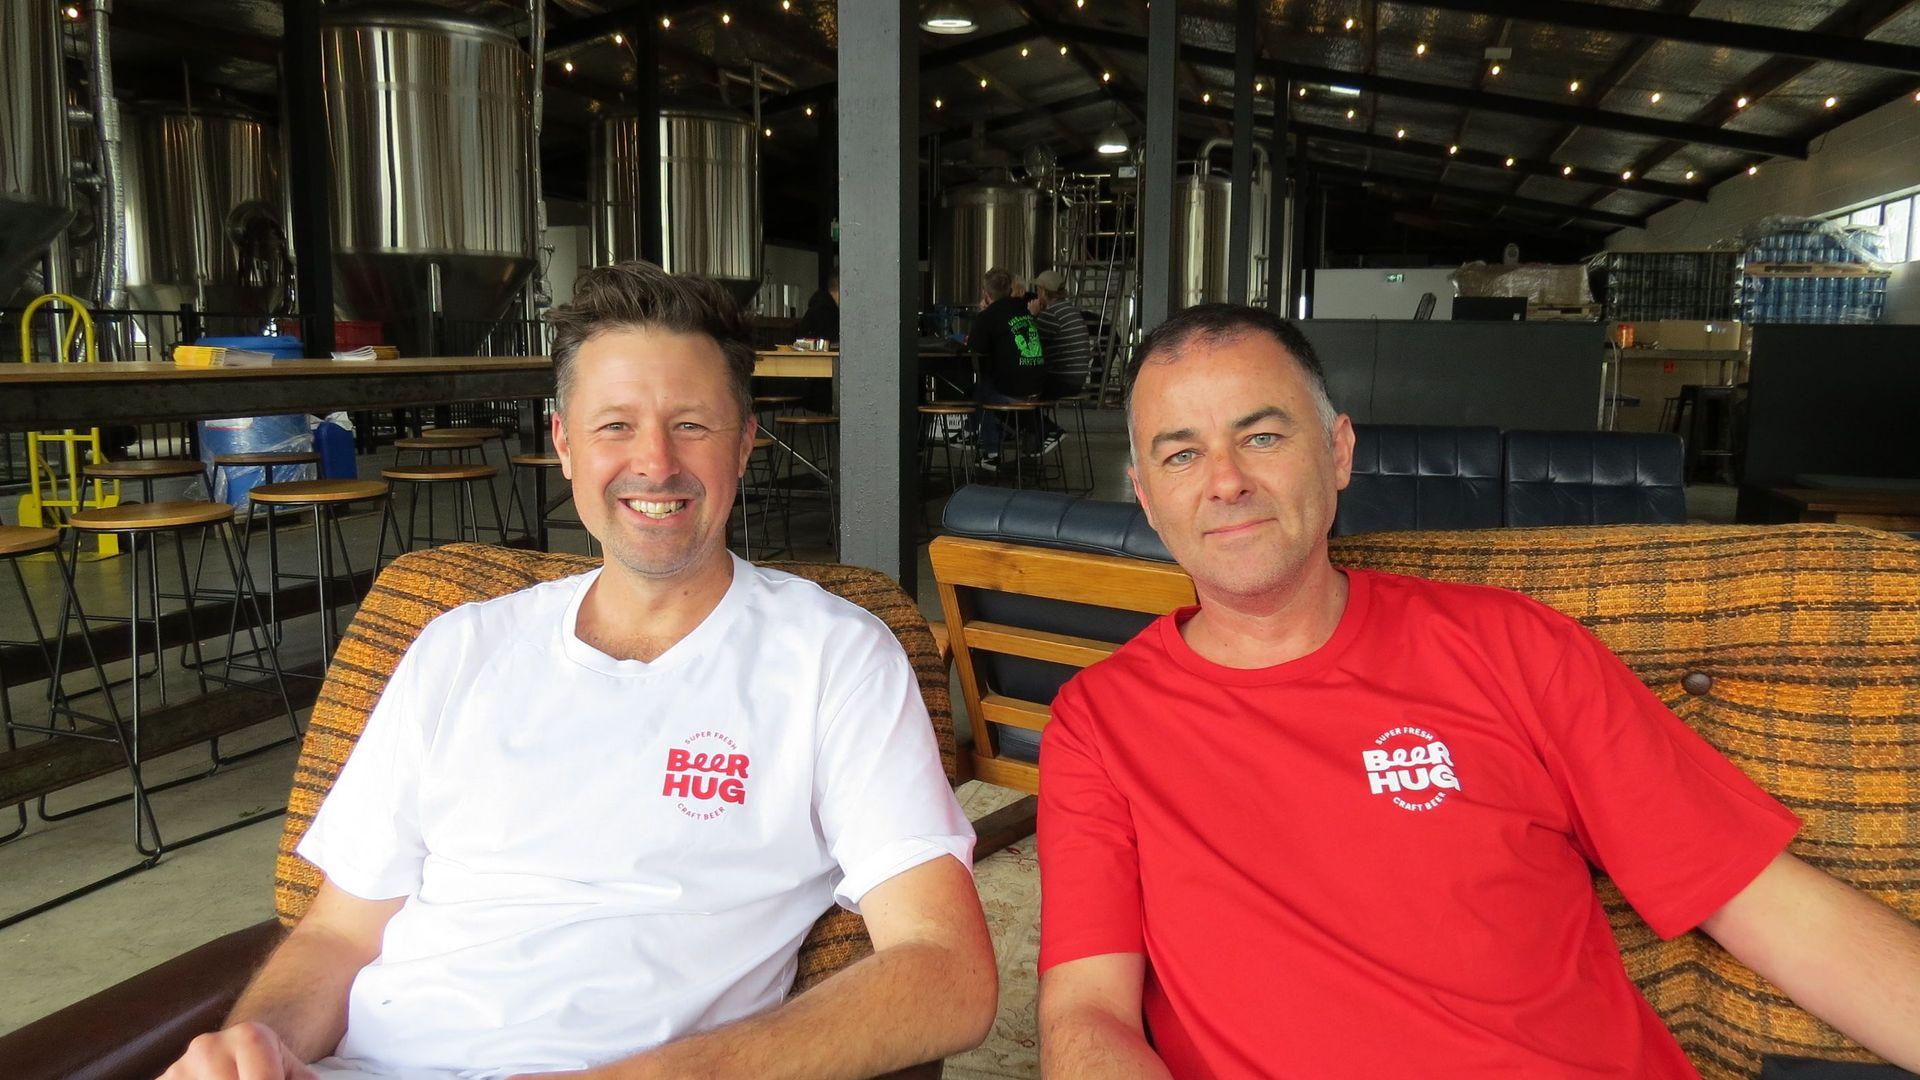 Online craft brews for Hawke's Bay beer lovers